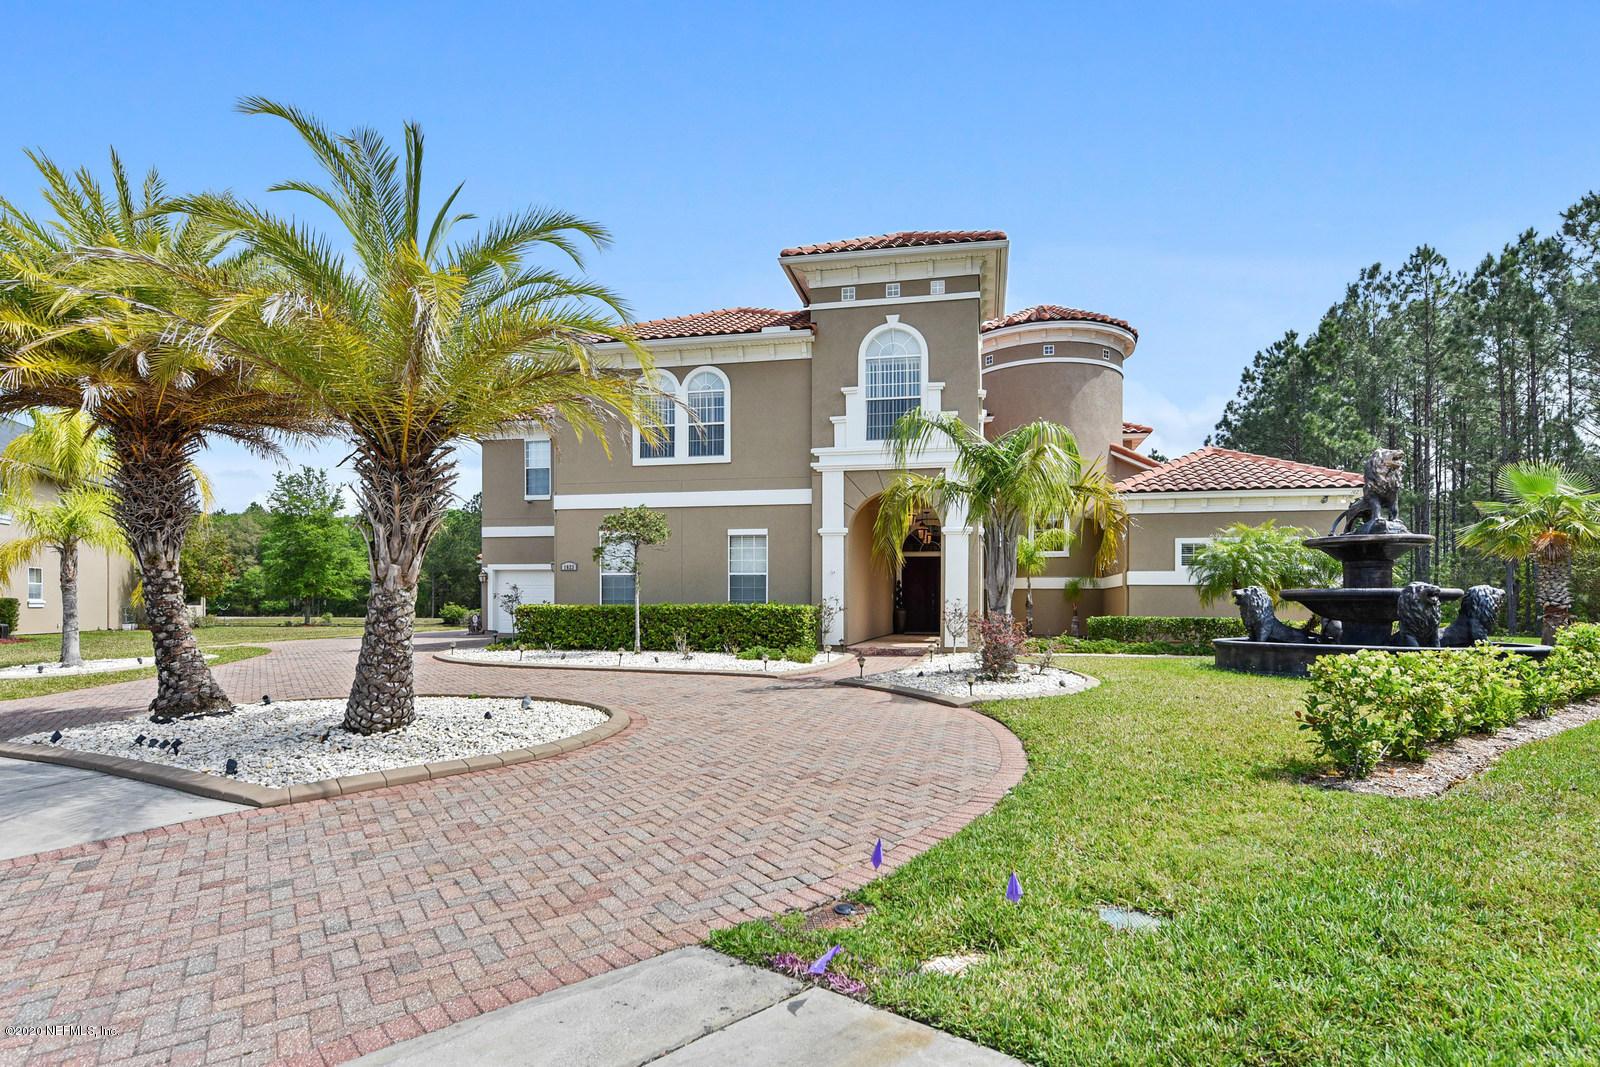 1623 CROOKED OAK, ORANGE PARK, FLORIDA 32065, 5 Bedrooms Bedrooms, ,5 BathroomsBathrooms,Residential,For sale,CROOKED OAK,1045837